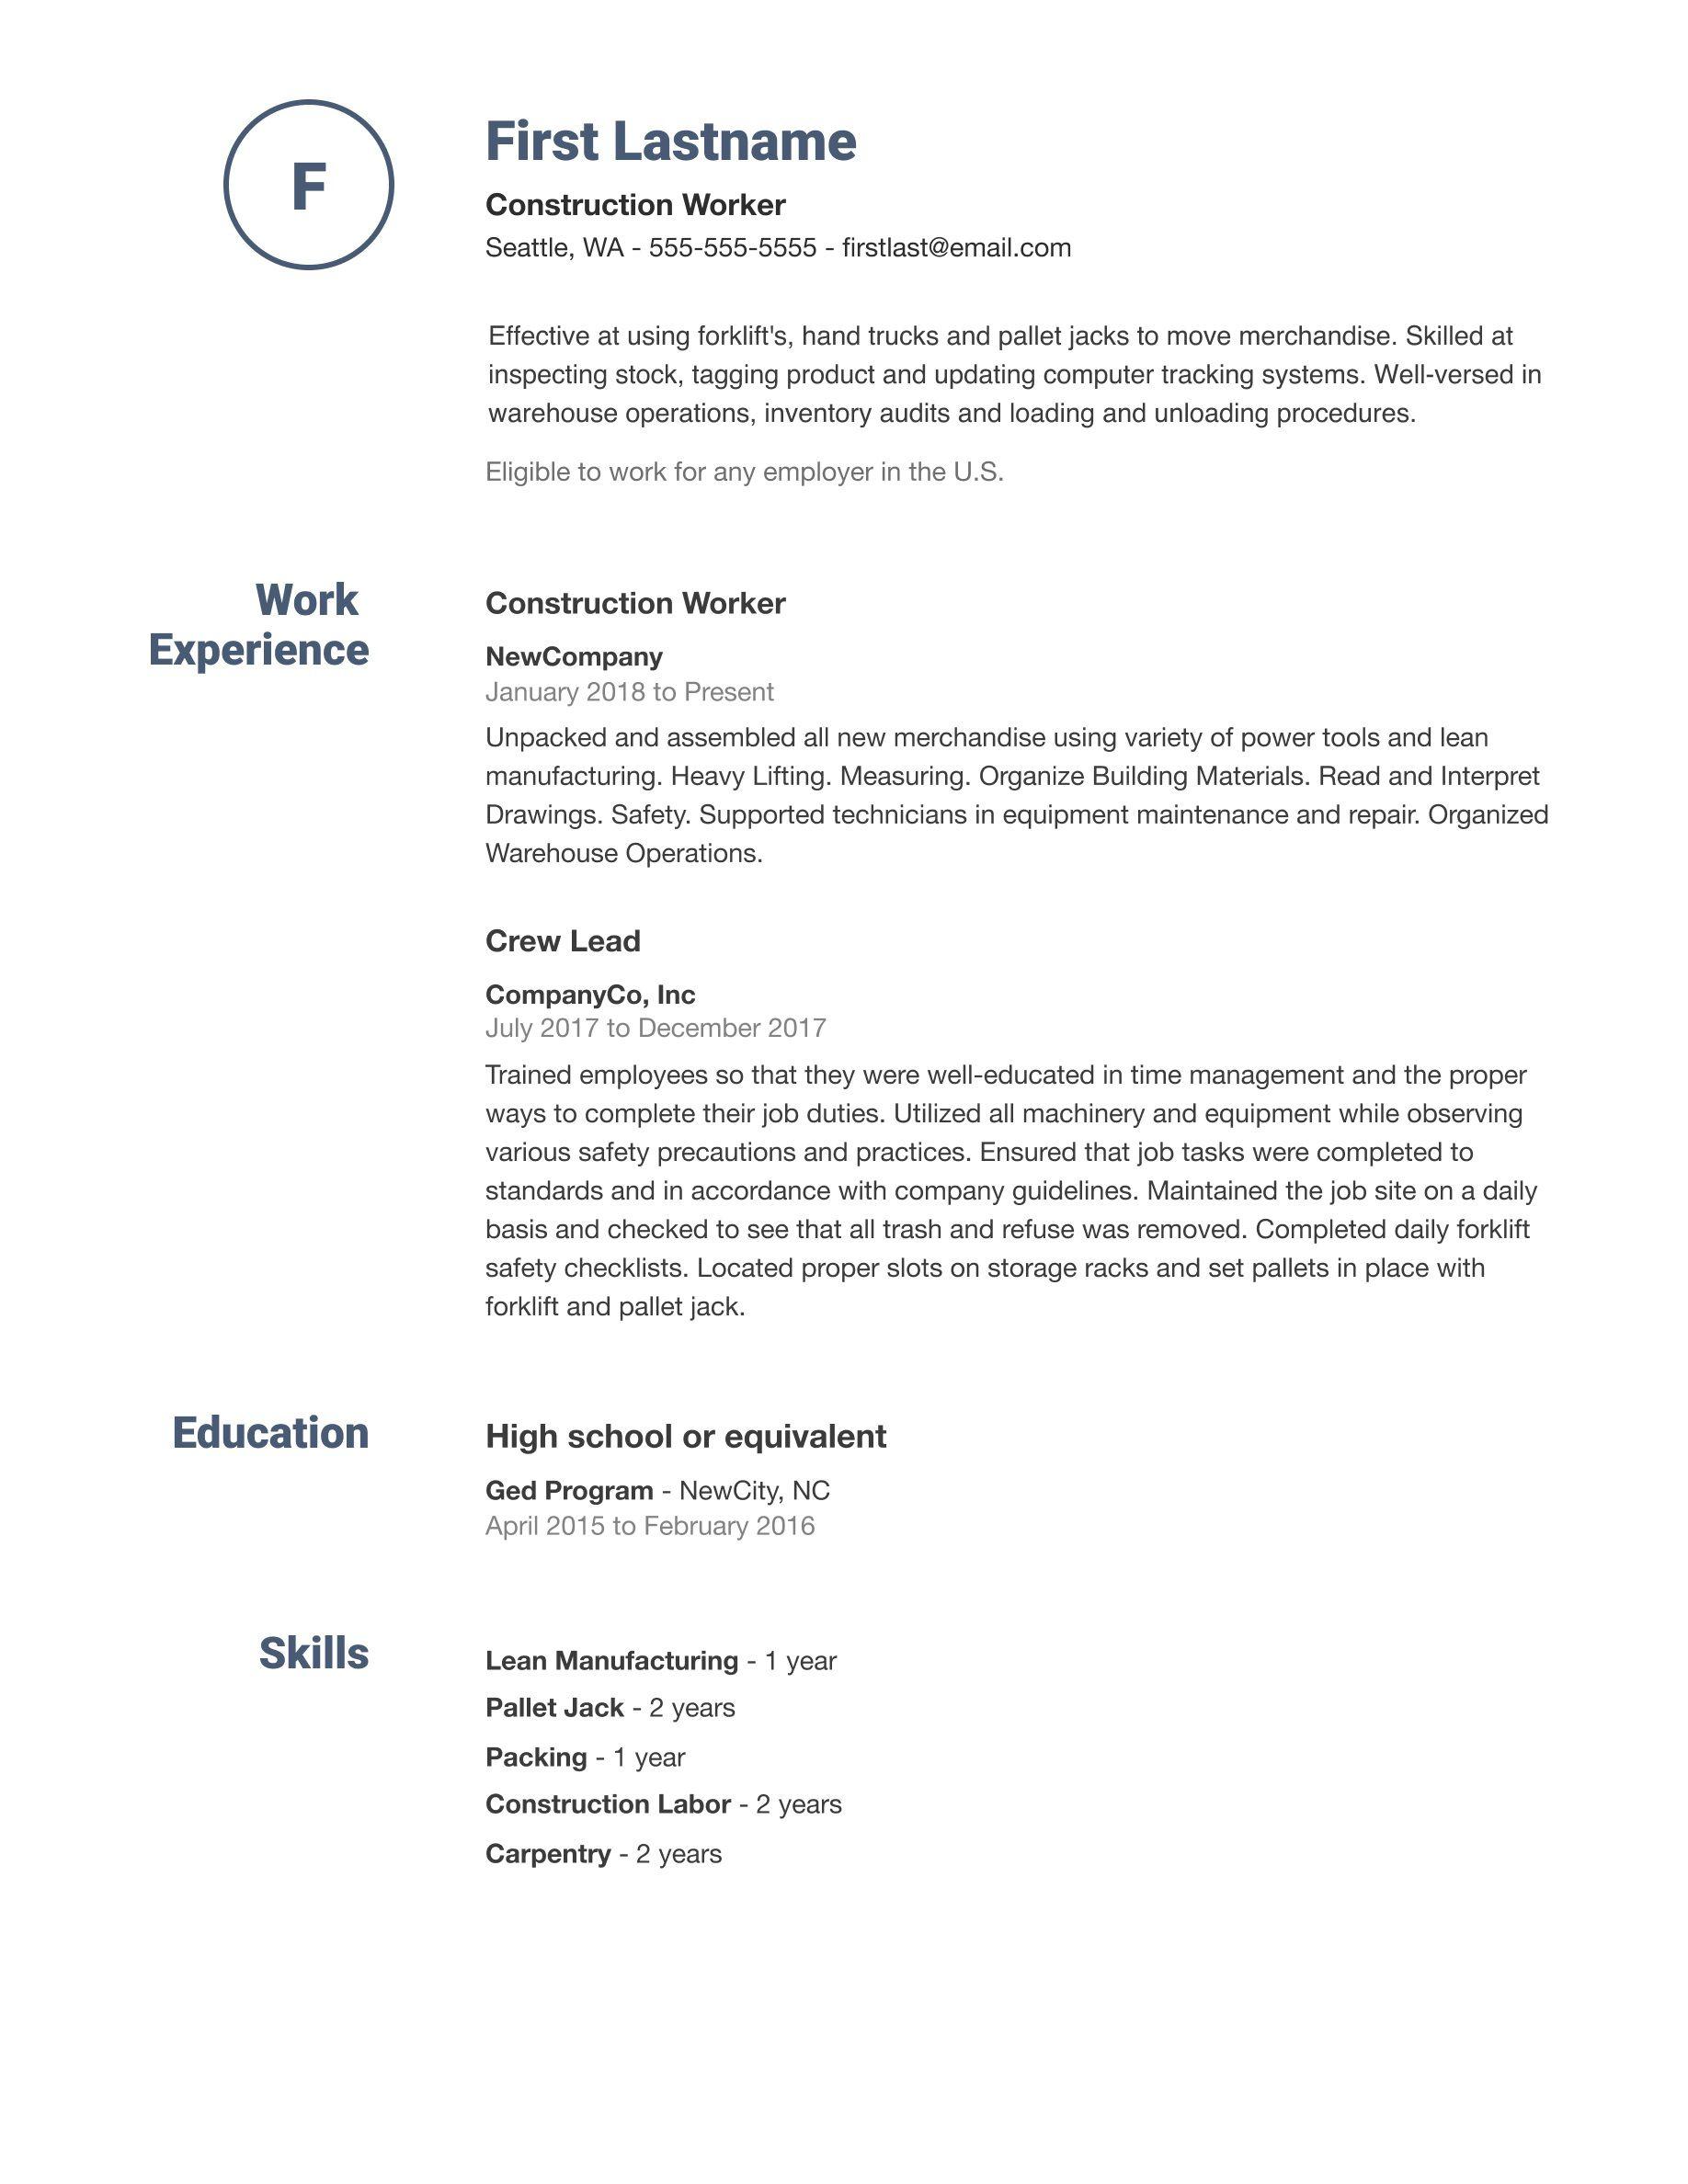 007 Frightening Basic Resume Template Free Design  Easy Download Word Australia DocFull